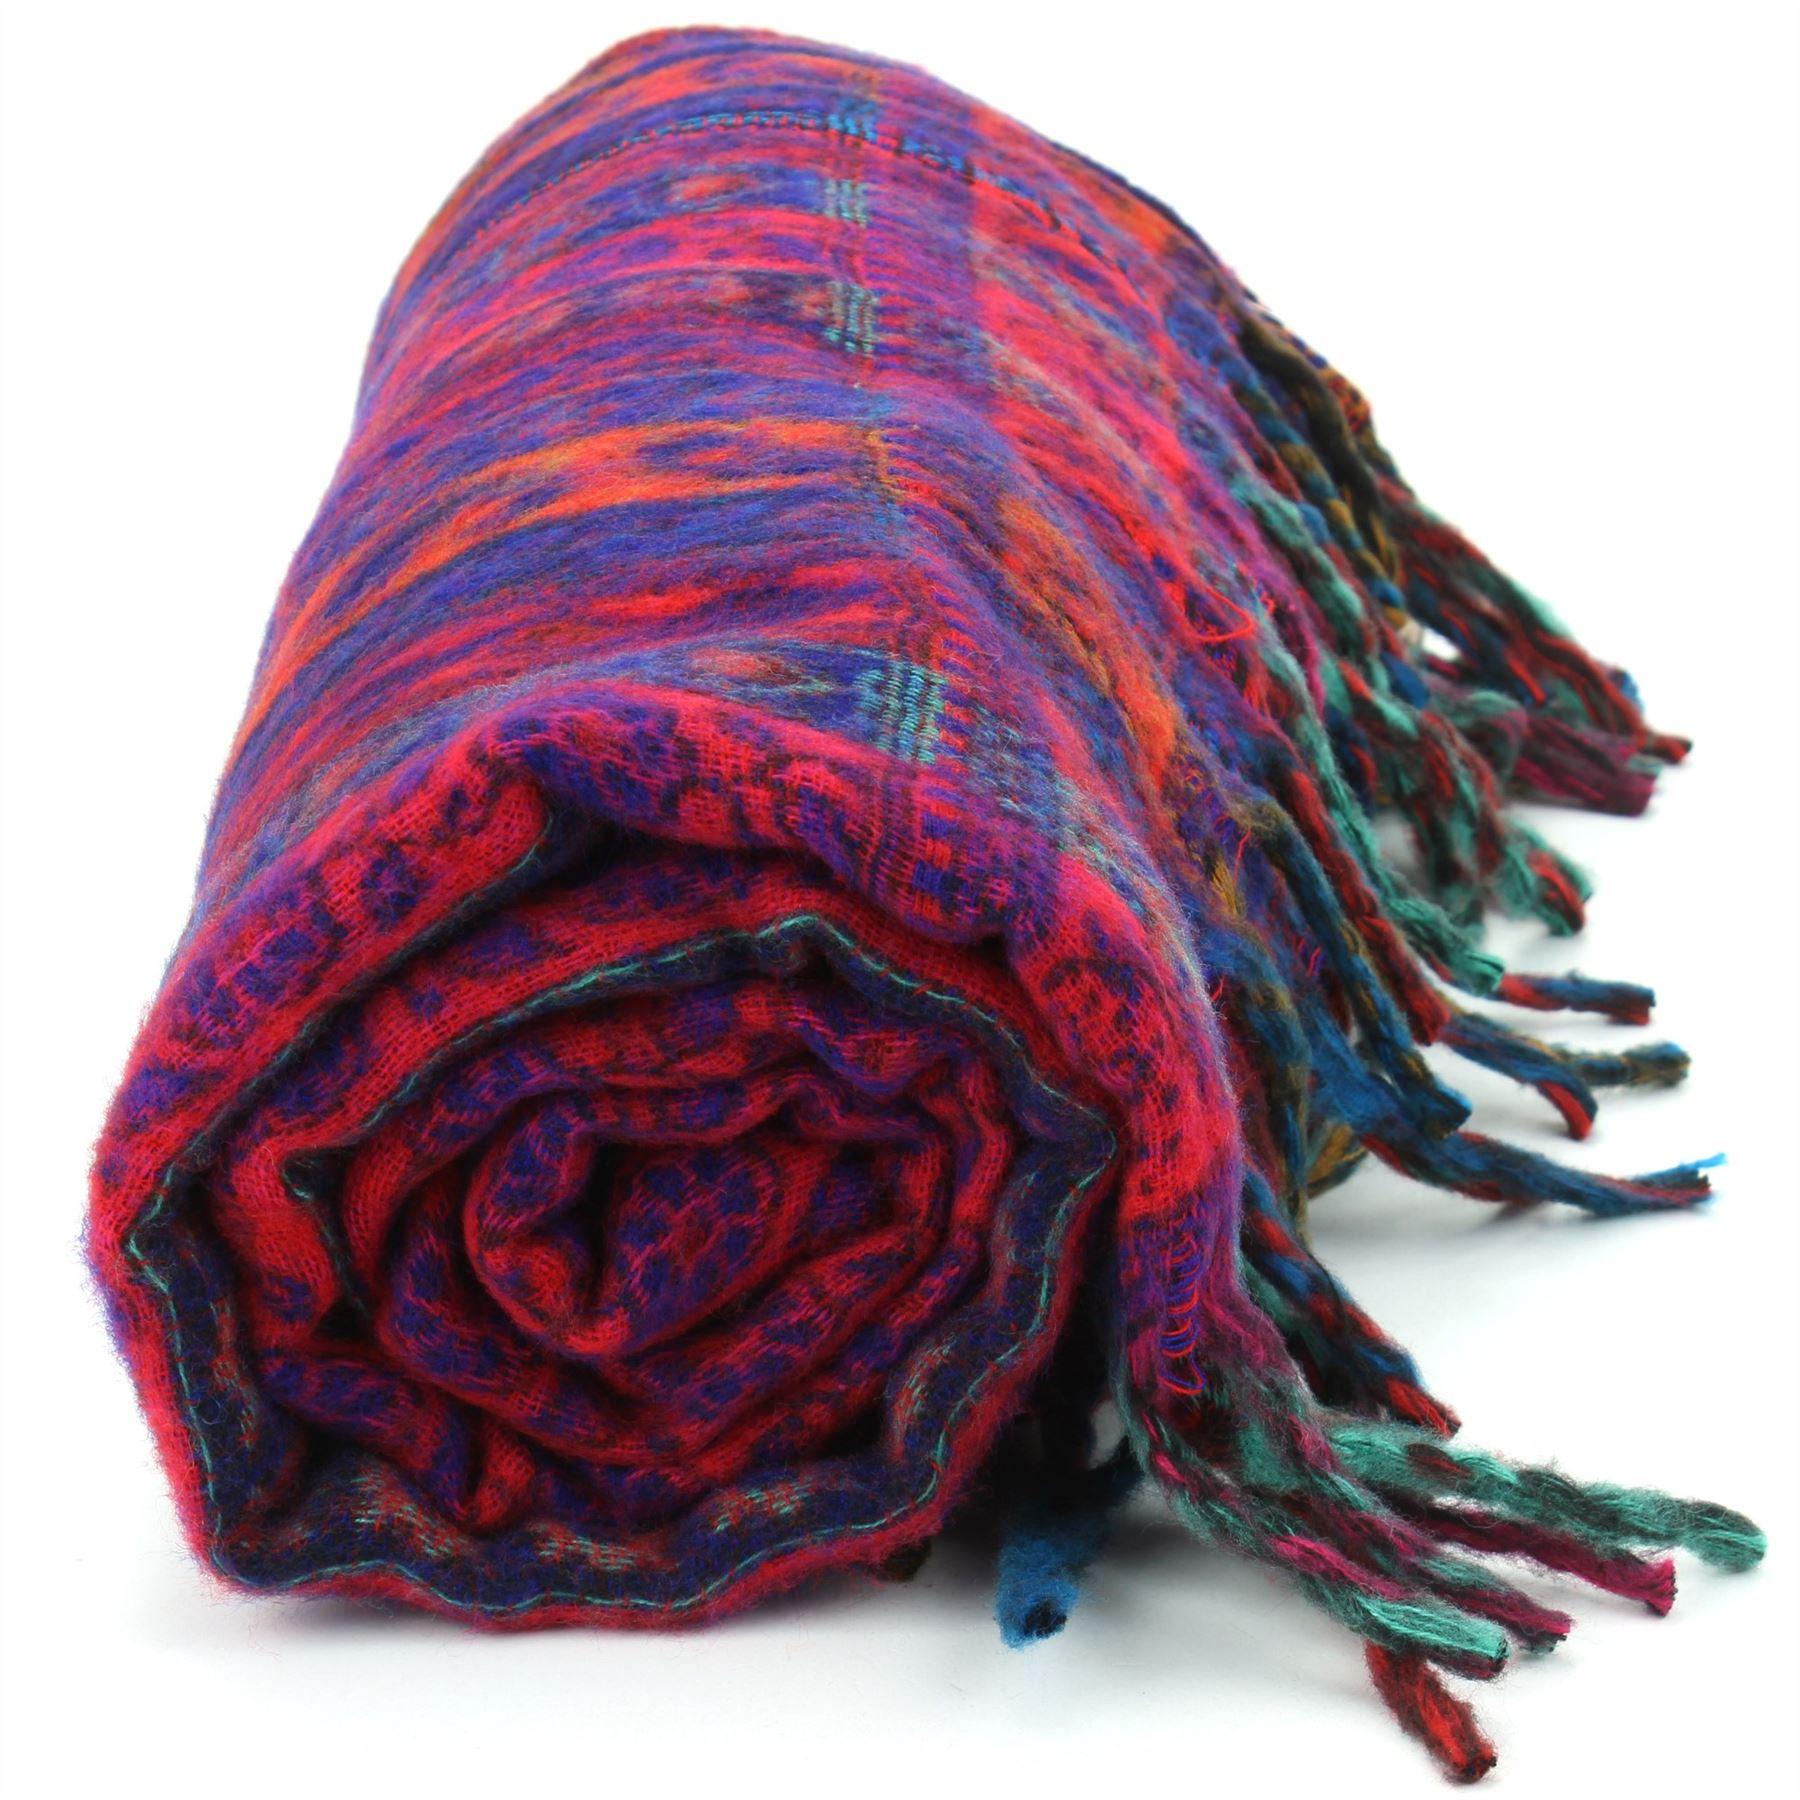 Acrylic-Wool-Blanket-Shawl-Wrap-Throw-Finest-Softest-India-Stripe-Paisley-Travel thumbnail 8